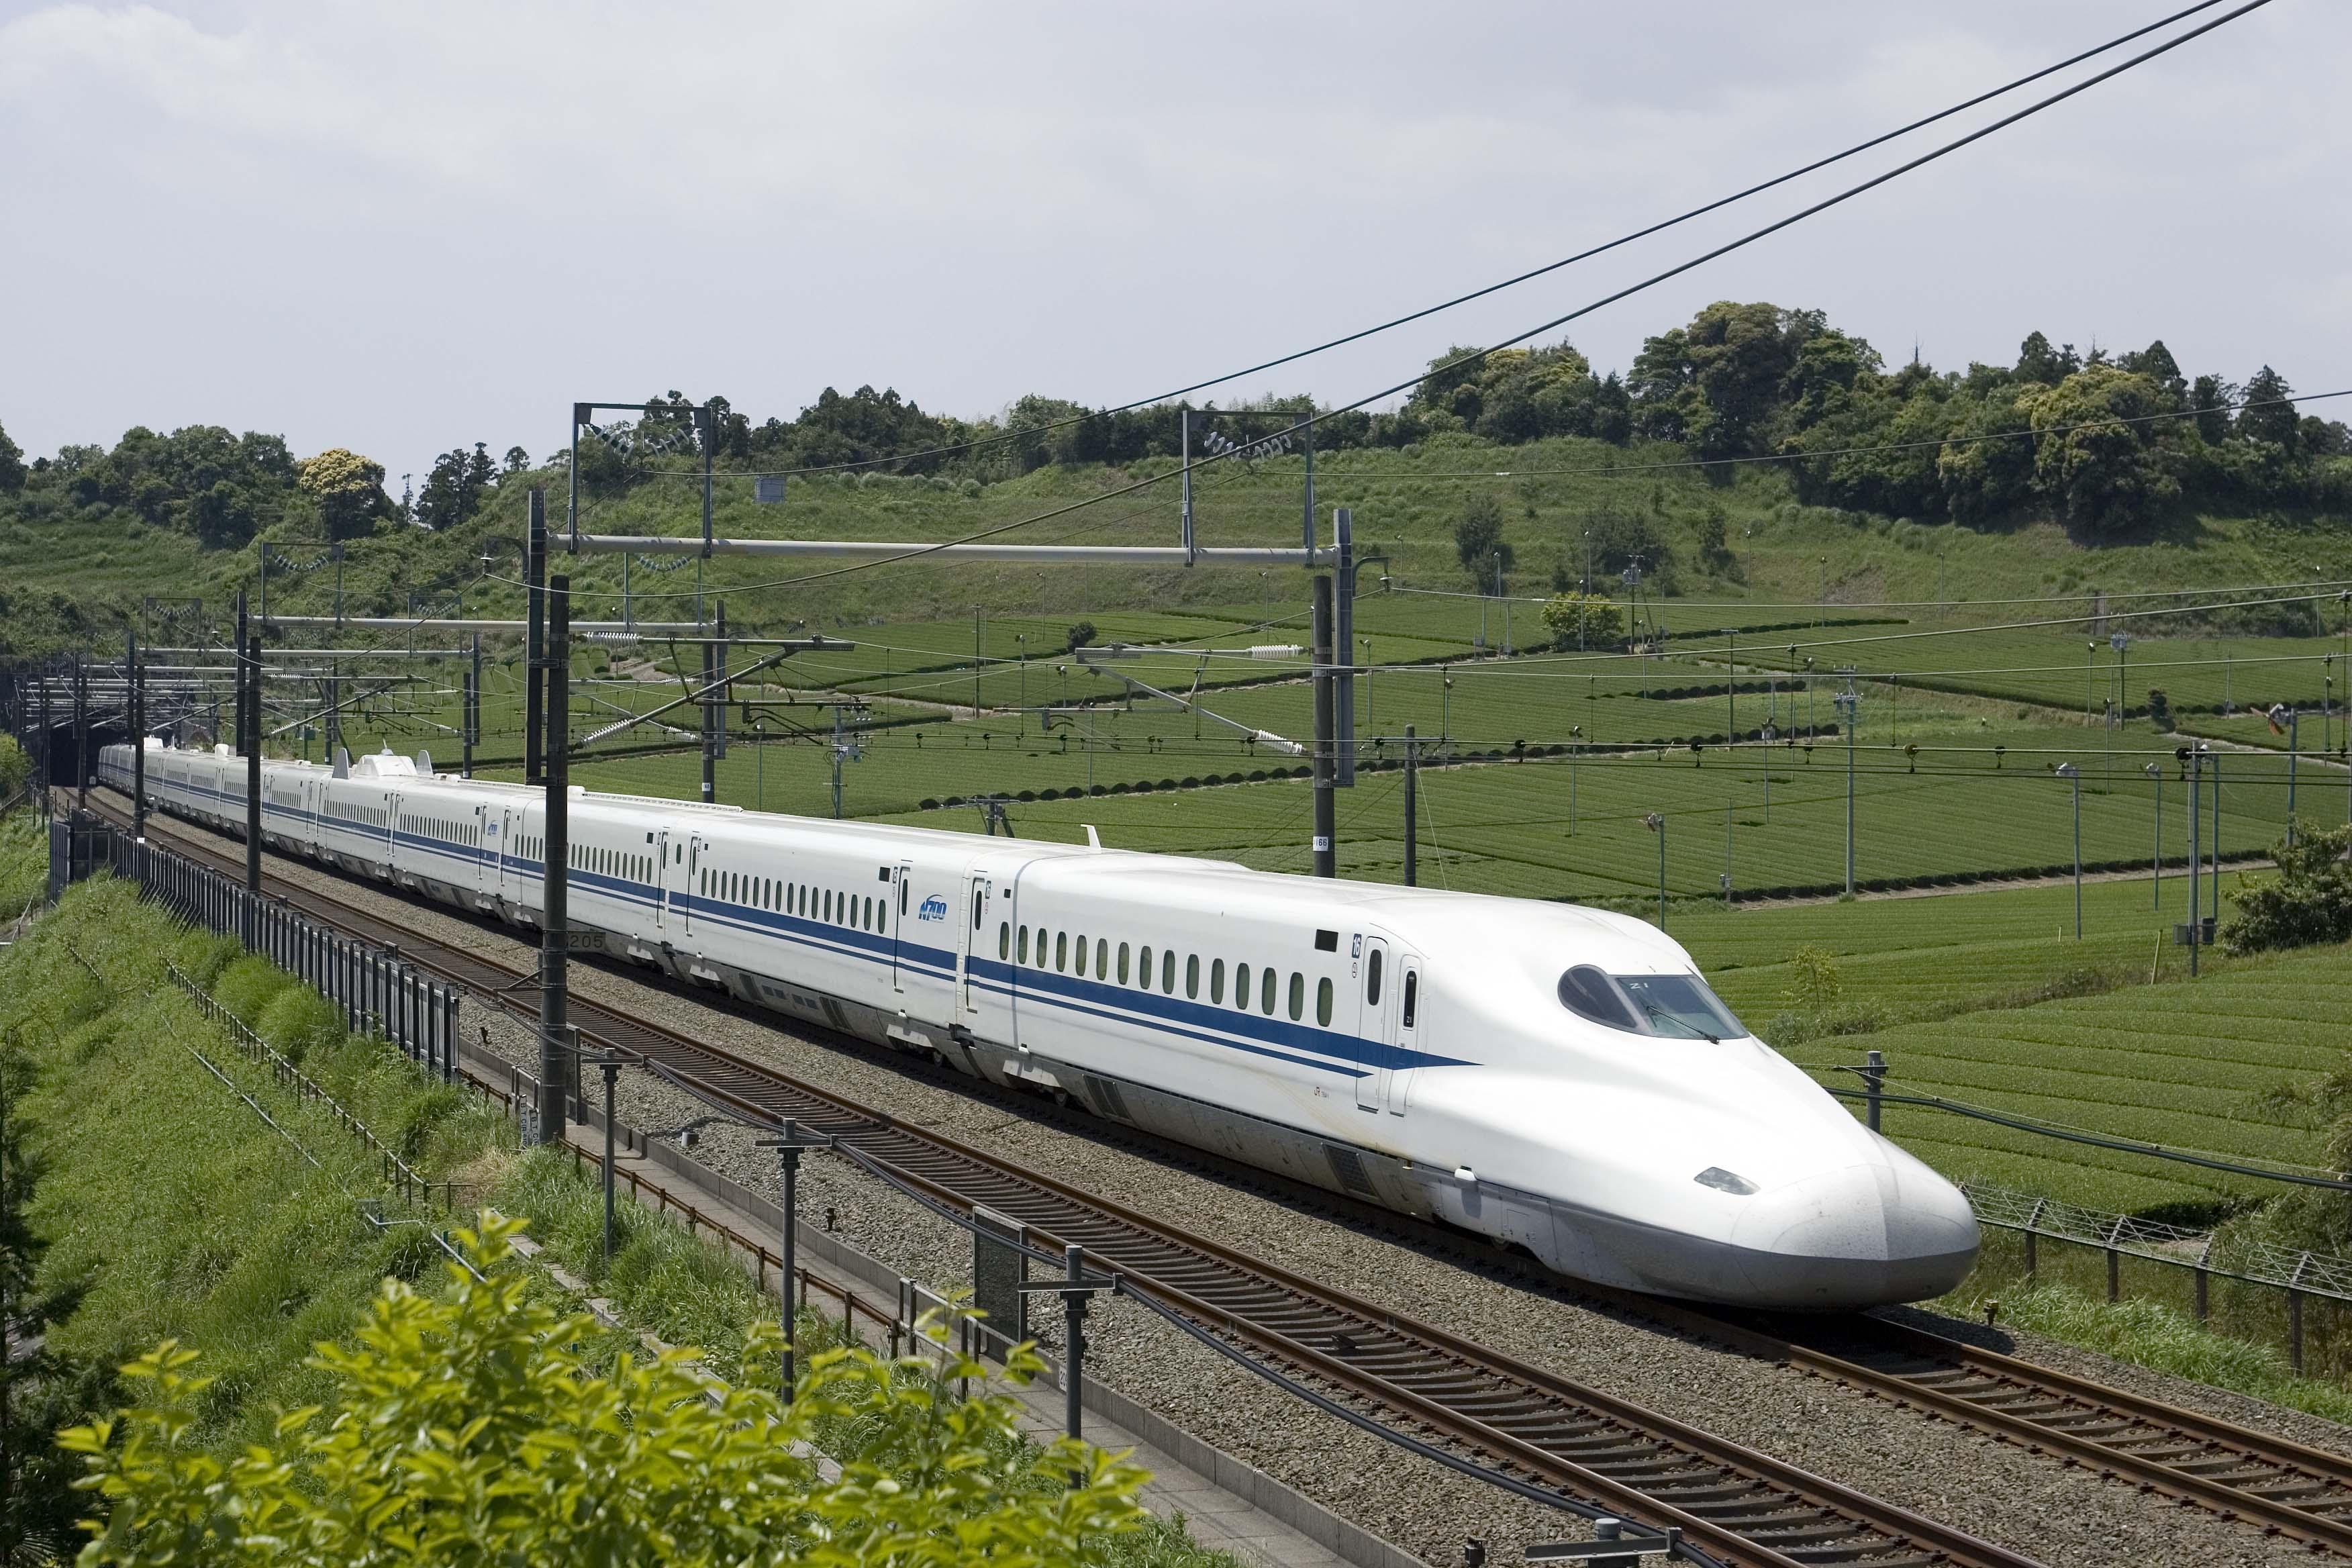 Fluor Enterprises, Lane Construction on track to design, build Texas